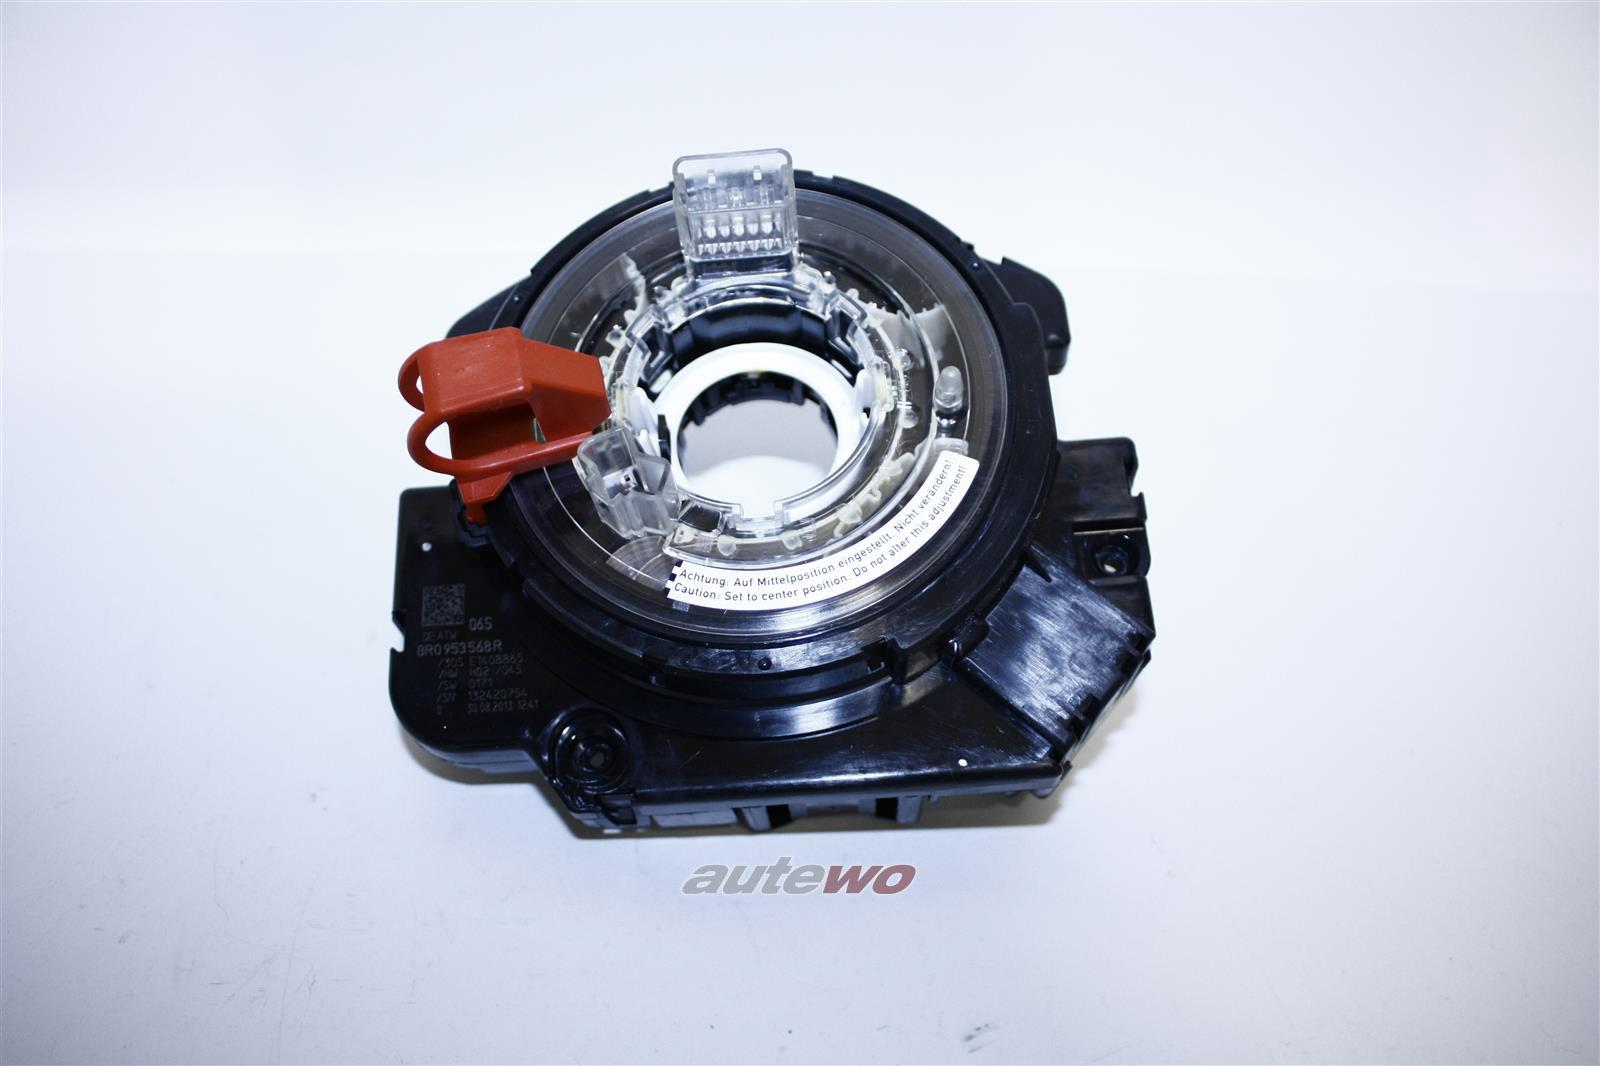 8R0953568R NEU Audi A4/S4/RS4 8K/A5/S5 8T Airbag-Schleifring